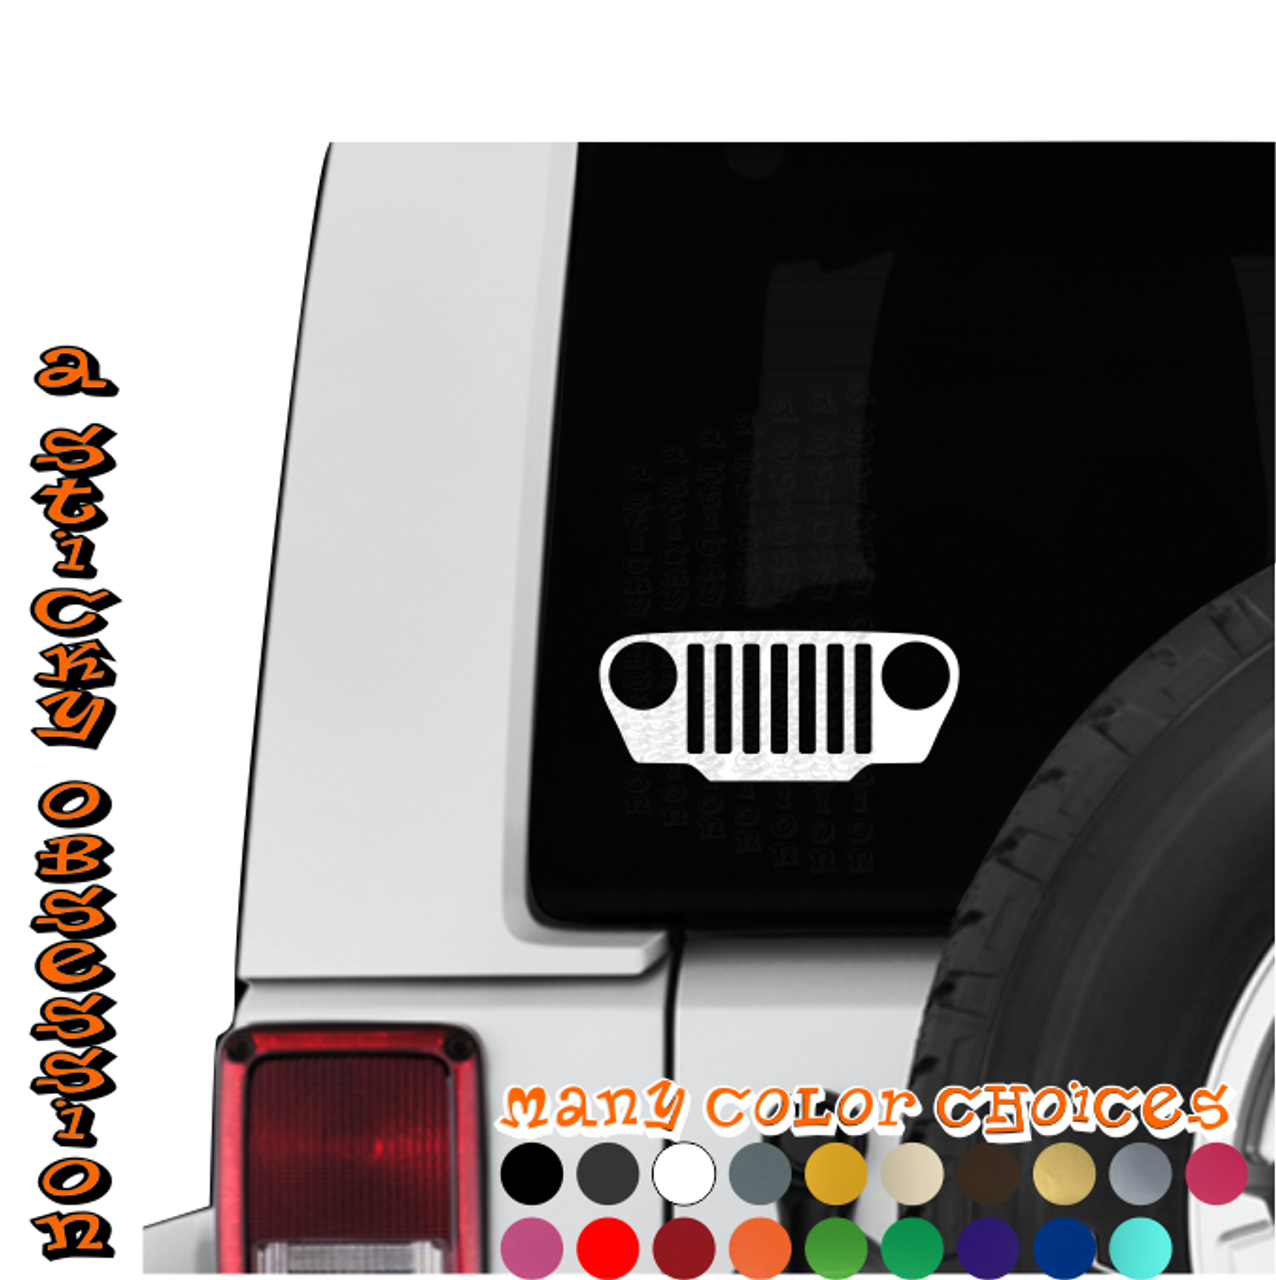 Jeep Wrangler Tj Jk Windshield Grill Decals Stickers buy 2 get 3!